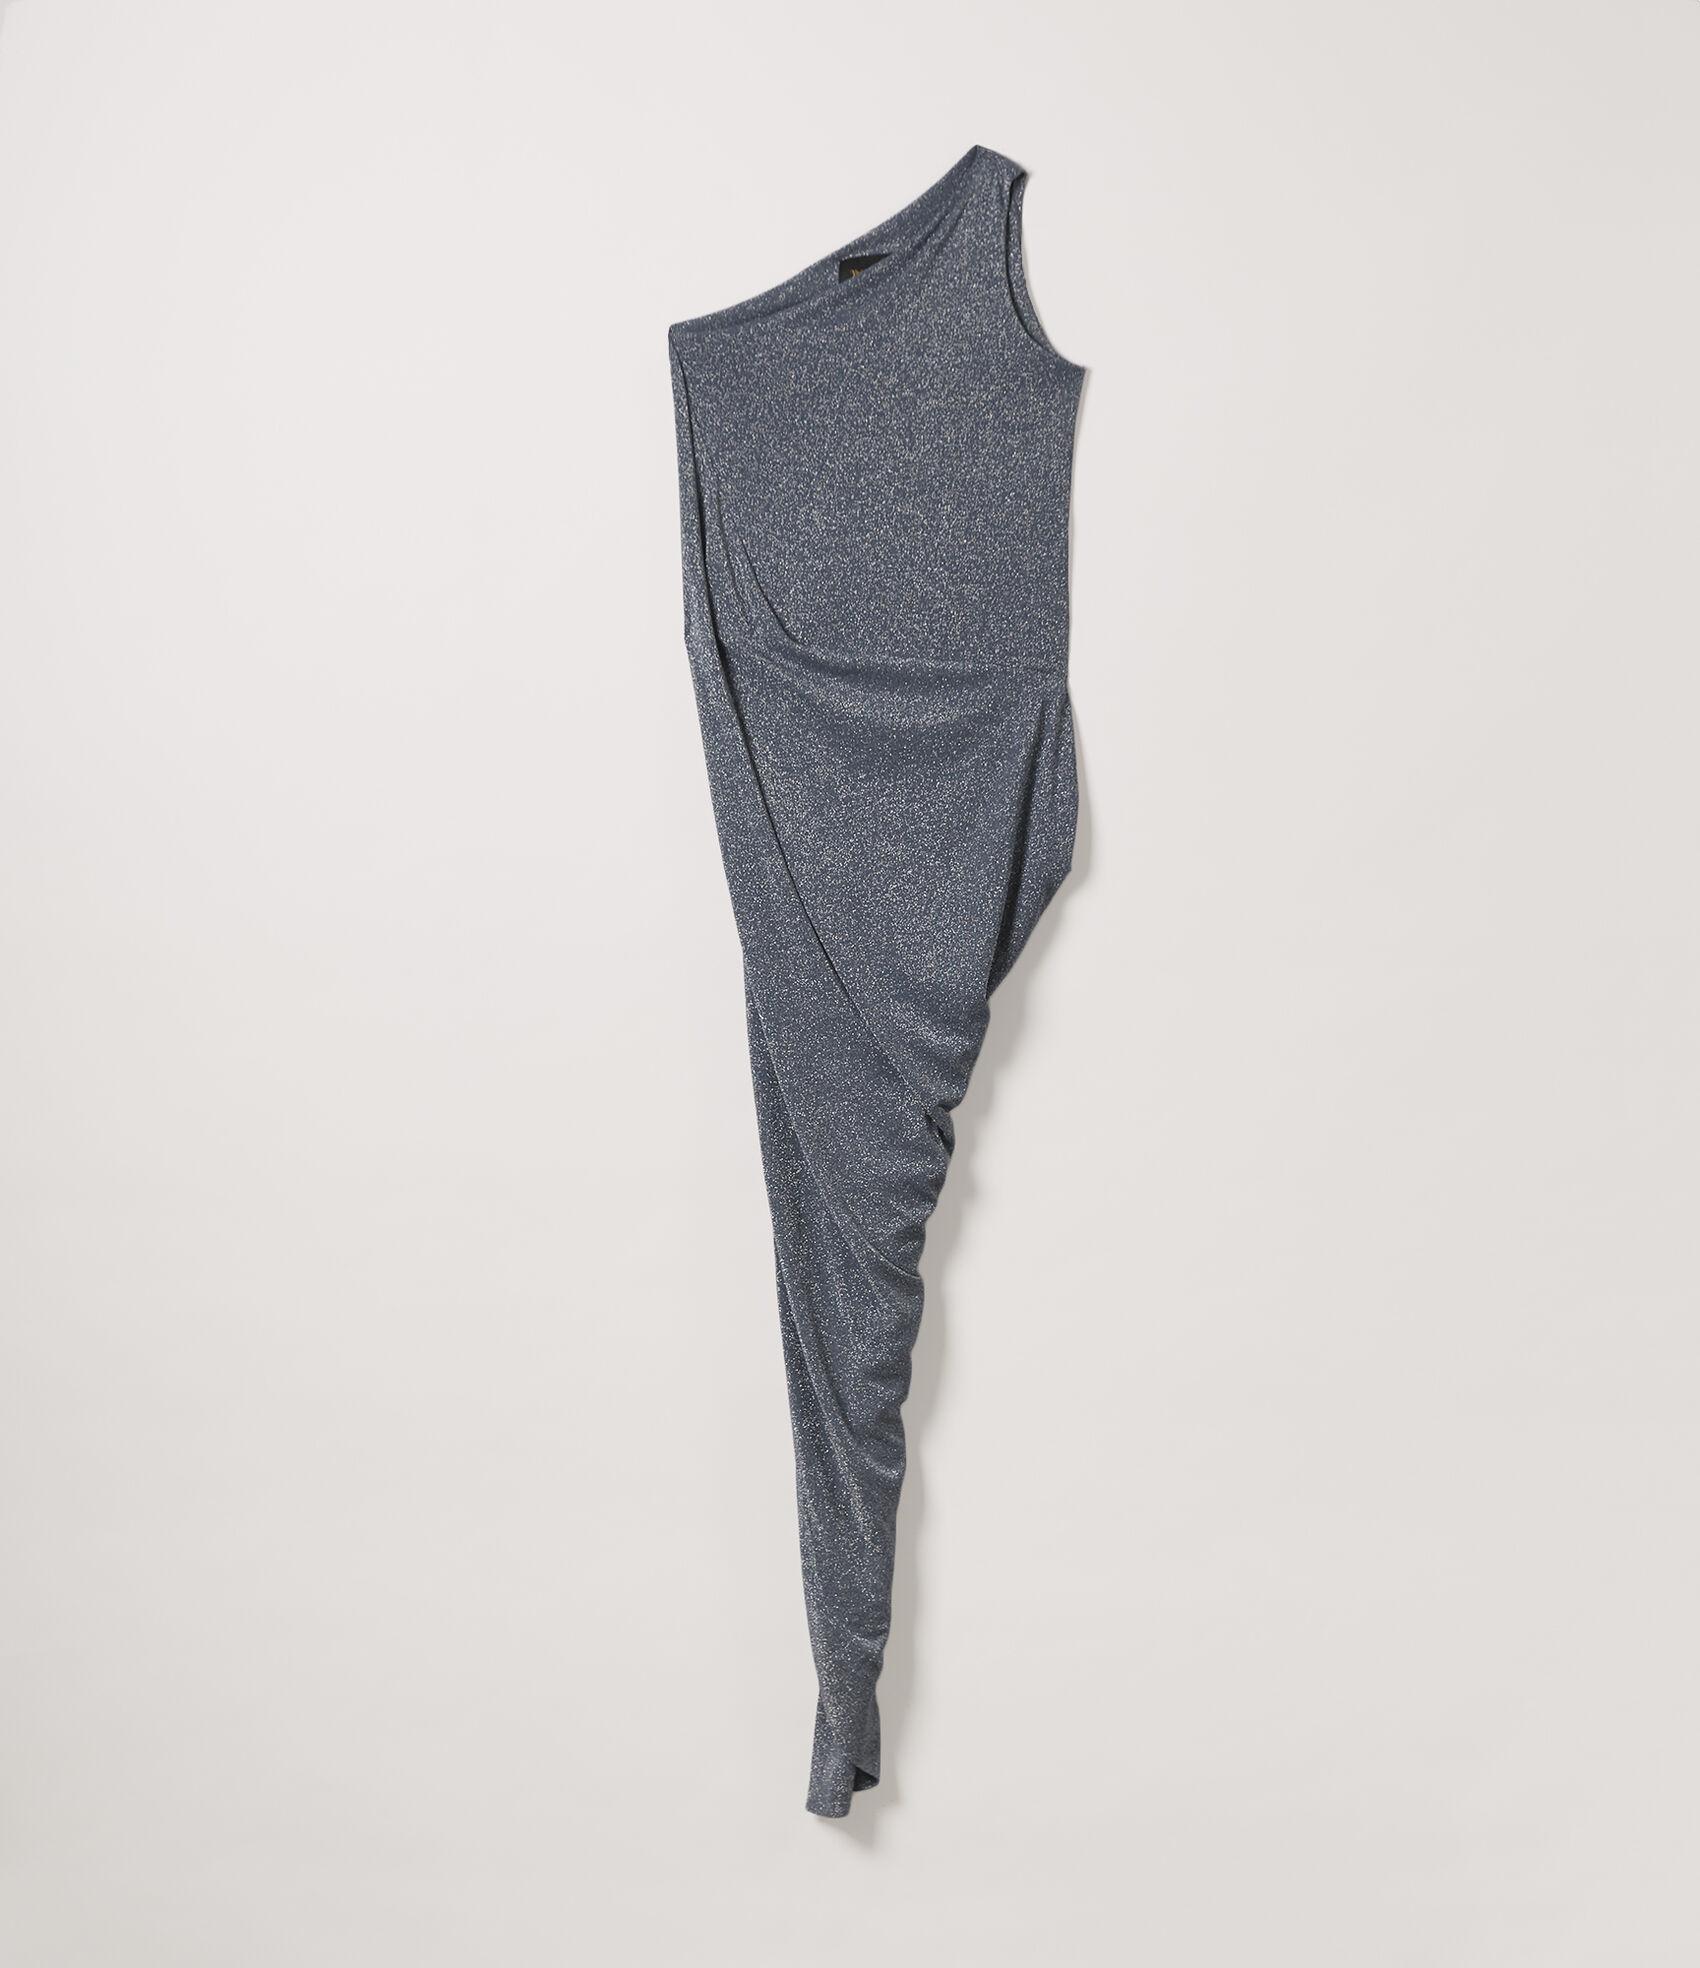 Vivienne Westwood Dresses Women S Clothing One Shoulder Vian Dress